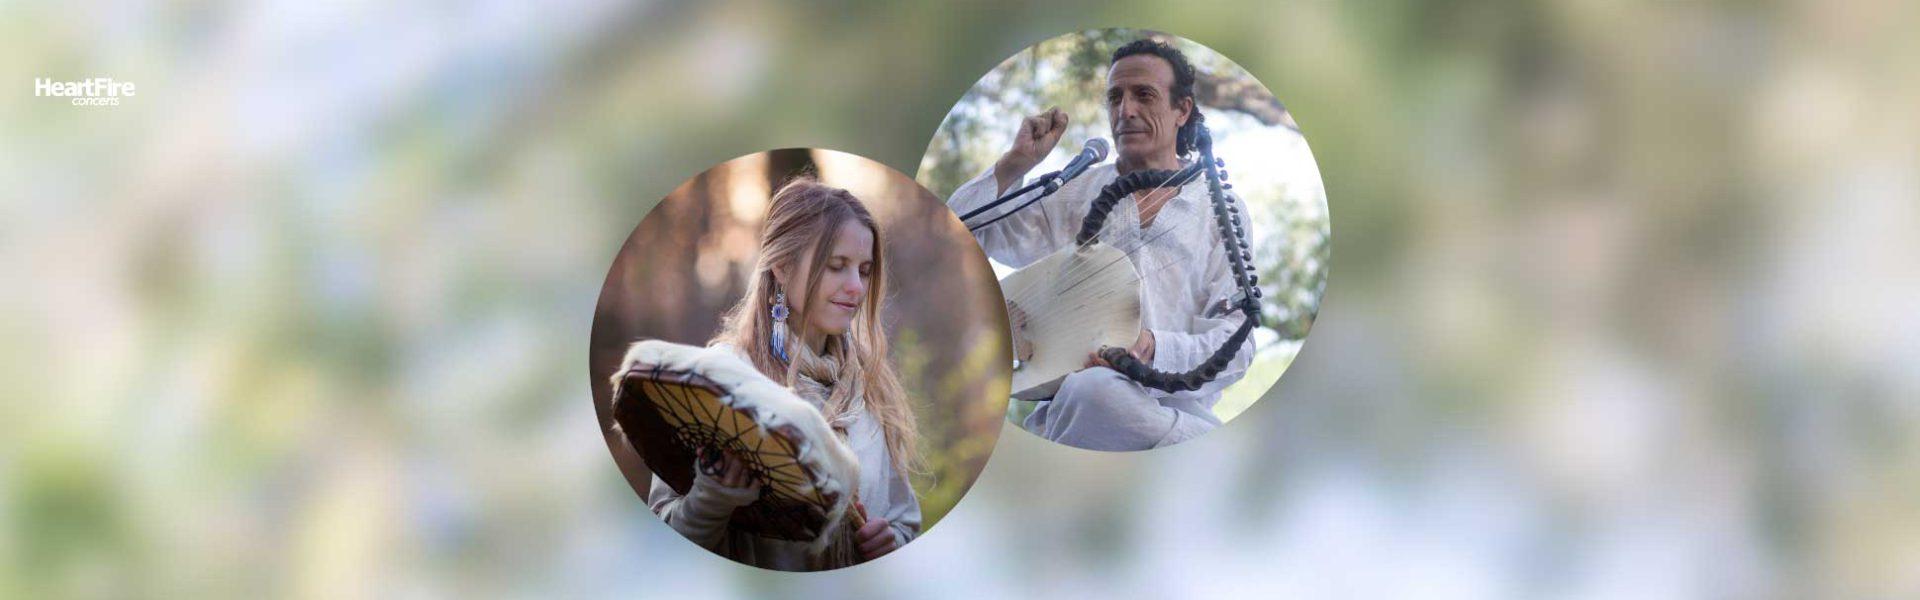 Luis Paniagua & Suyana :: Weaving Sound Into Silence :: 22 maart 2018 Blijburg